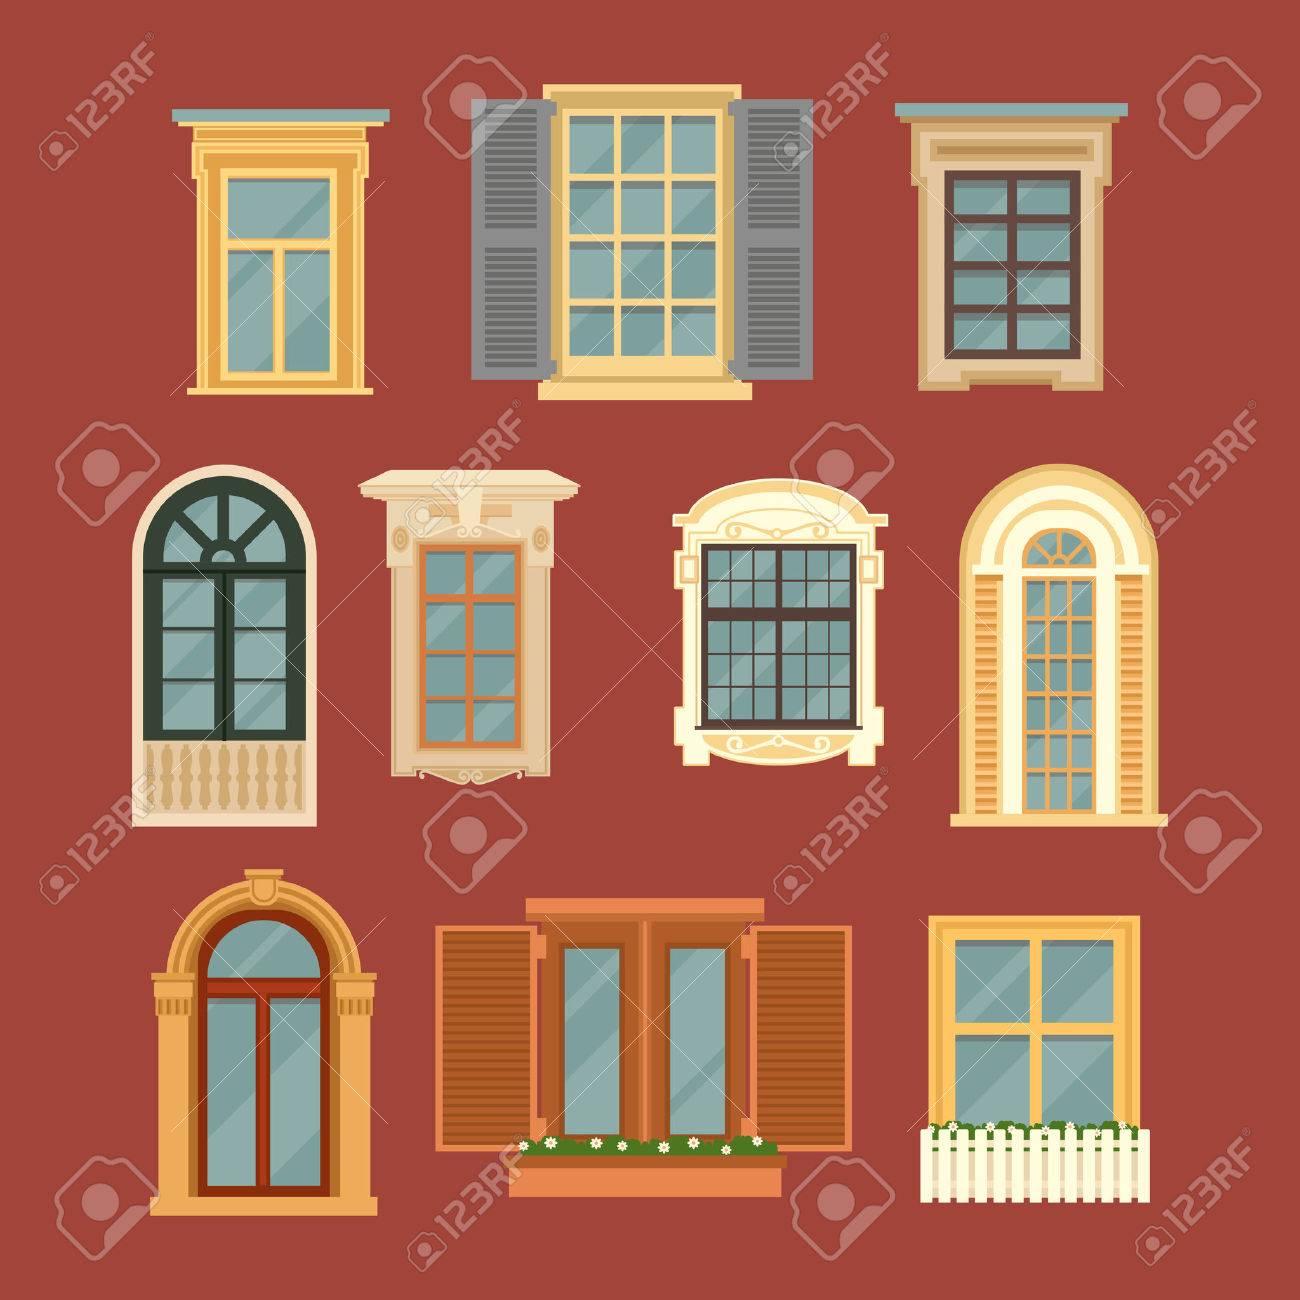 Set of Vintage Windows. Vector illustration in flat style - 52090850